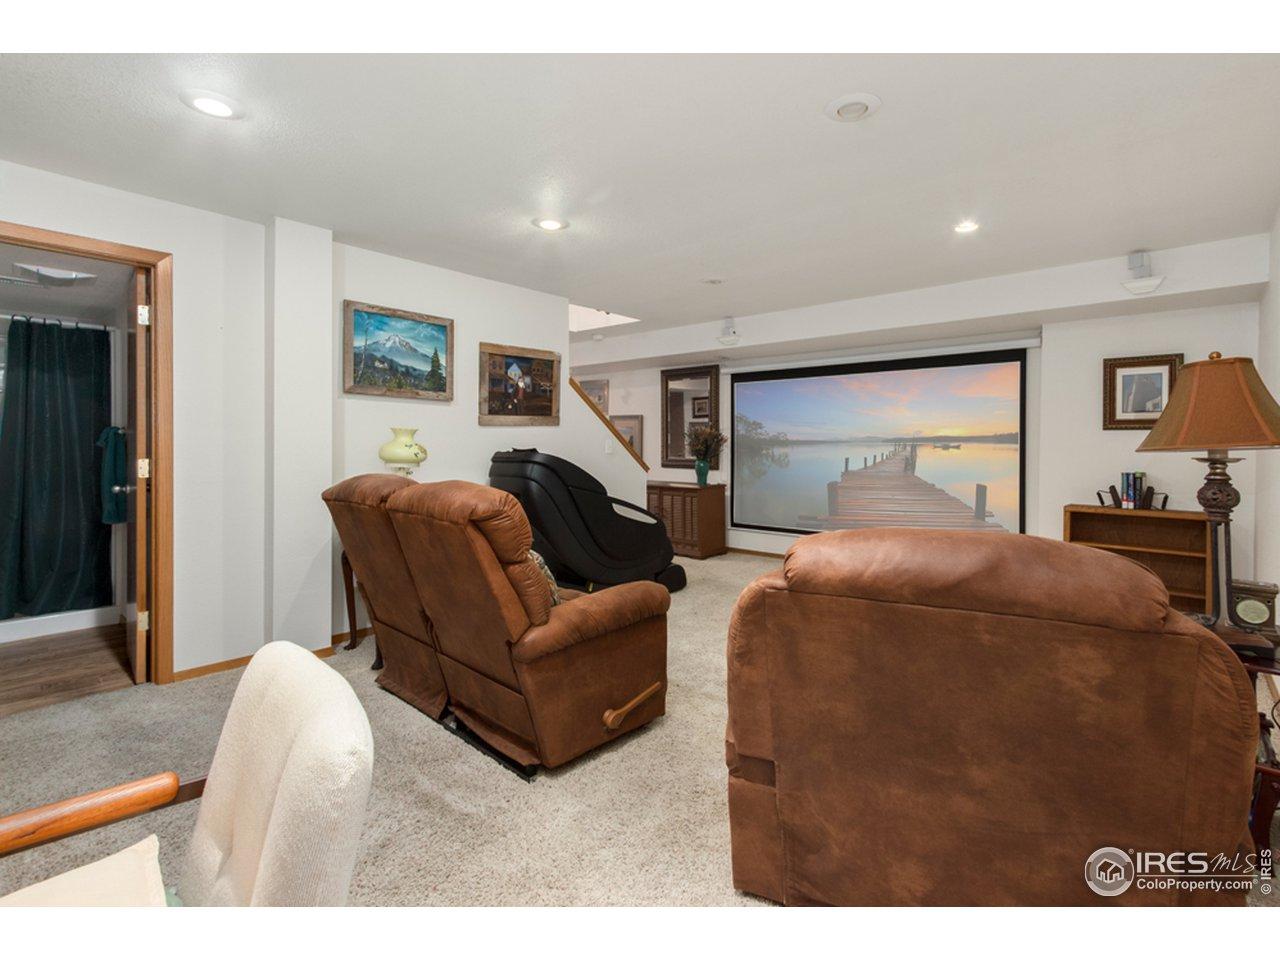 BasementFamily/Media/Bedroom Flex Area